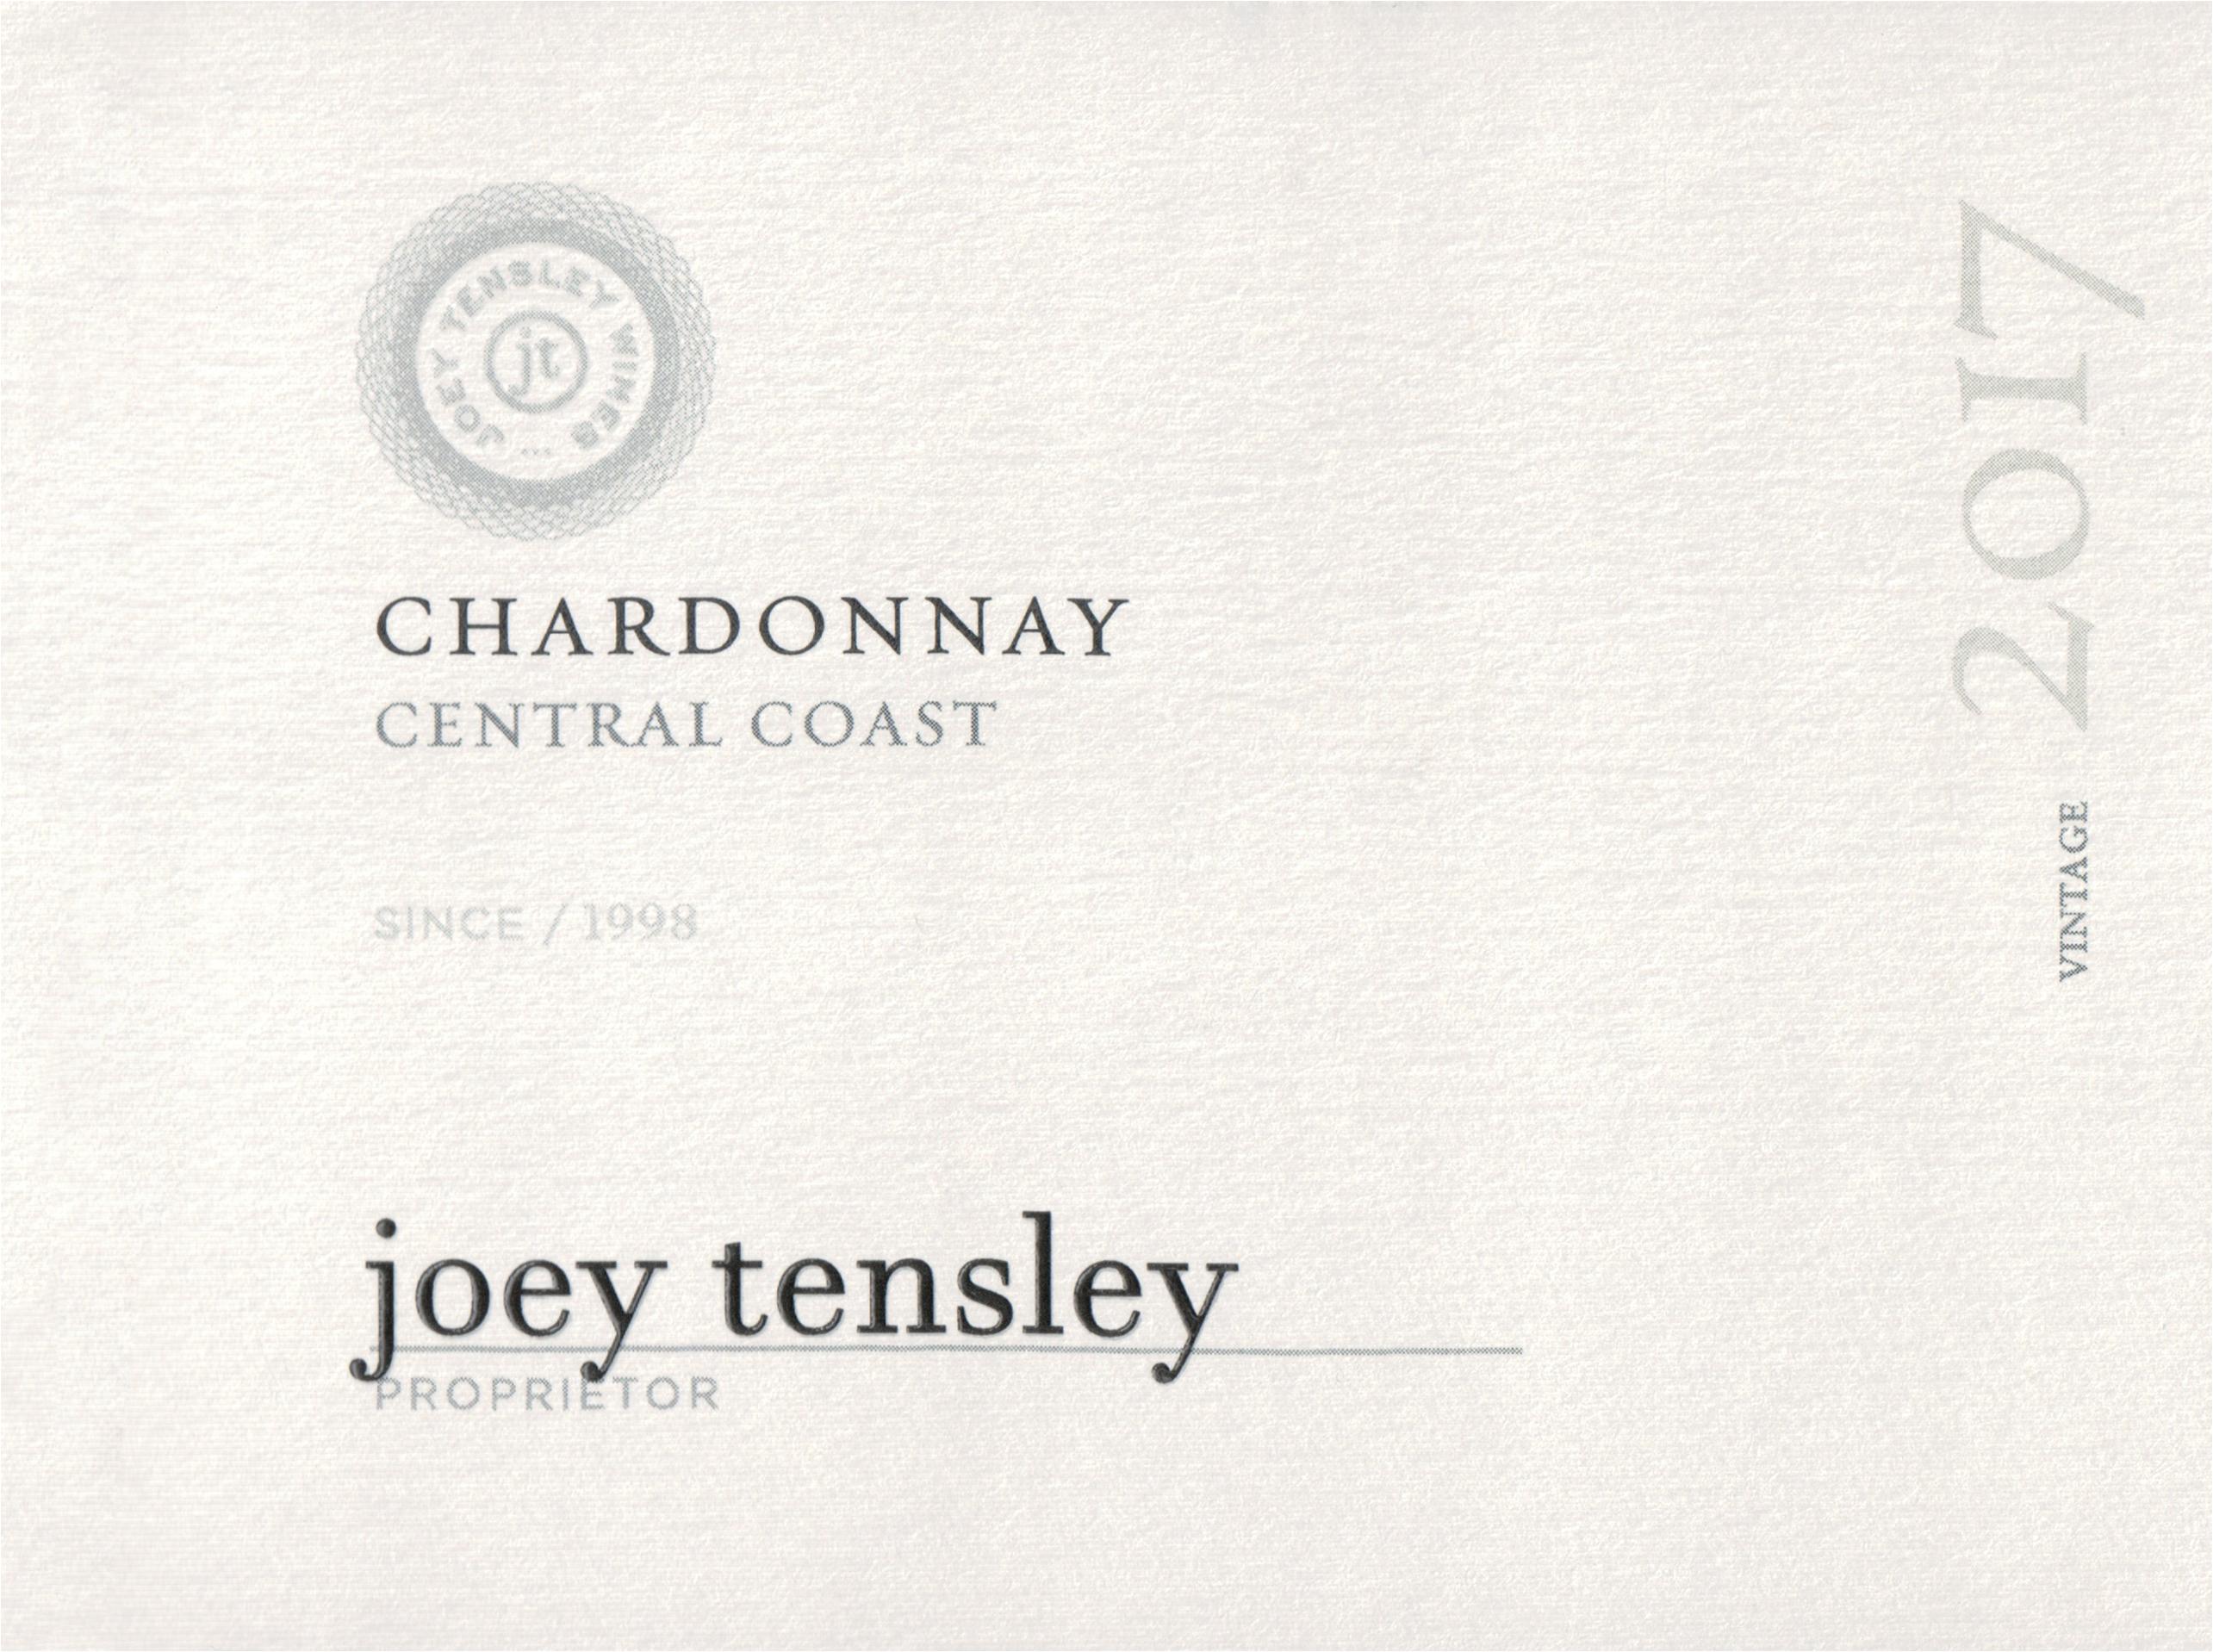 Joey Tensley Central Coast Chardonnay 2017